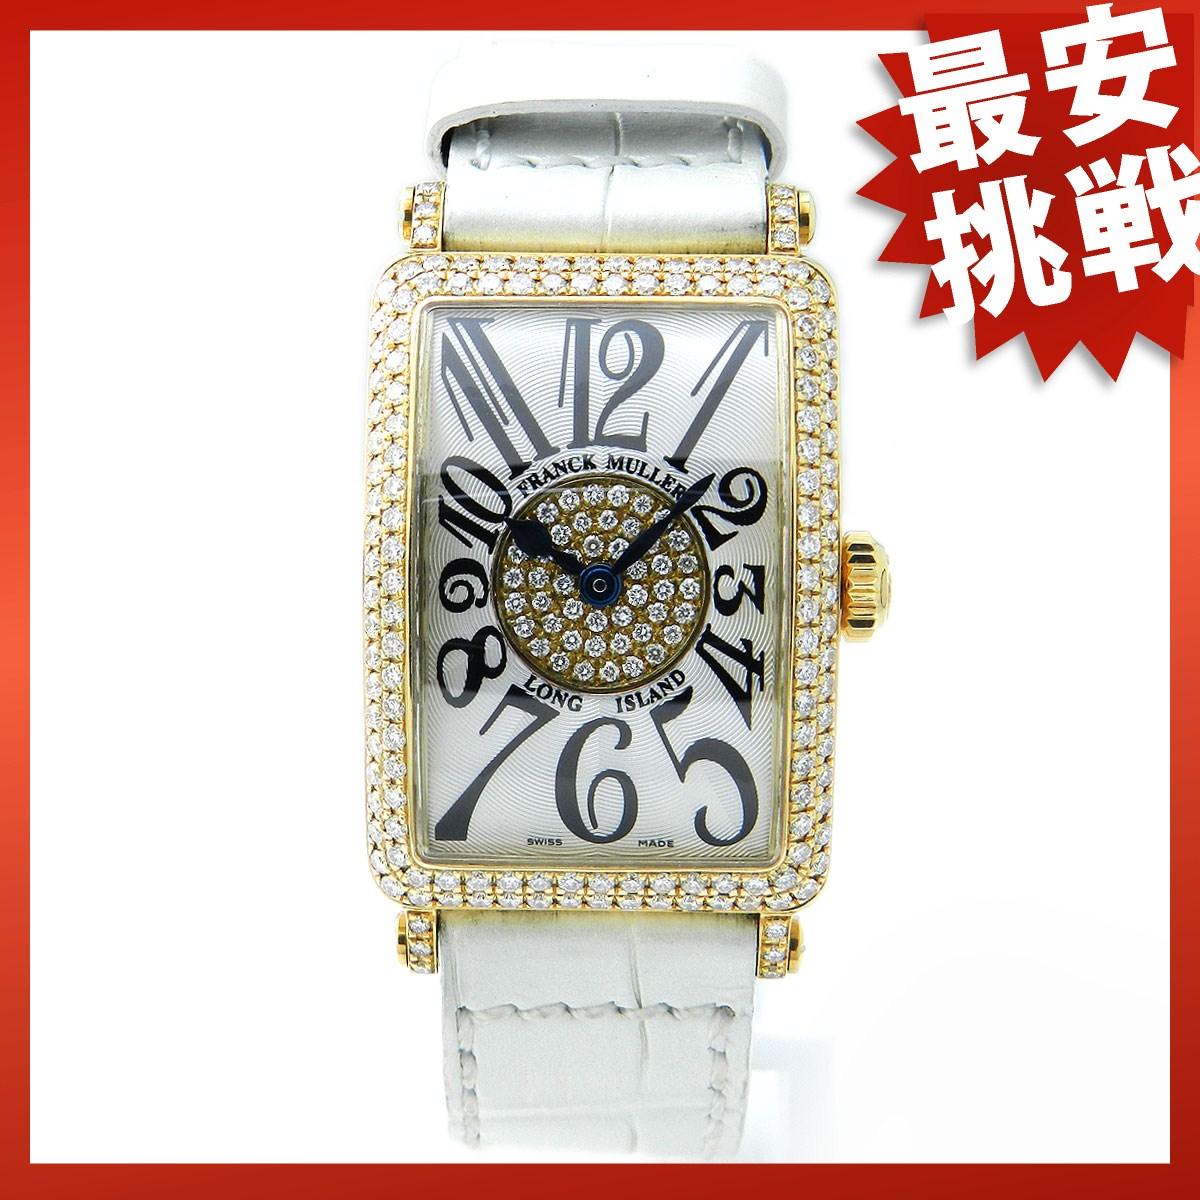 FRANCK MULLER 902QZ Long Island K18YG / leather watch